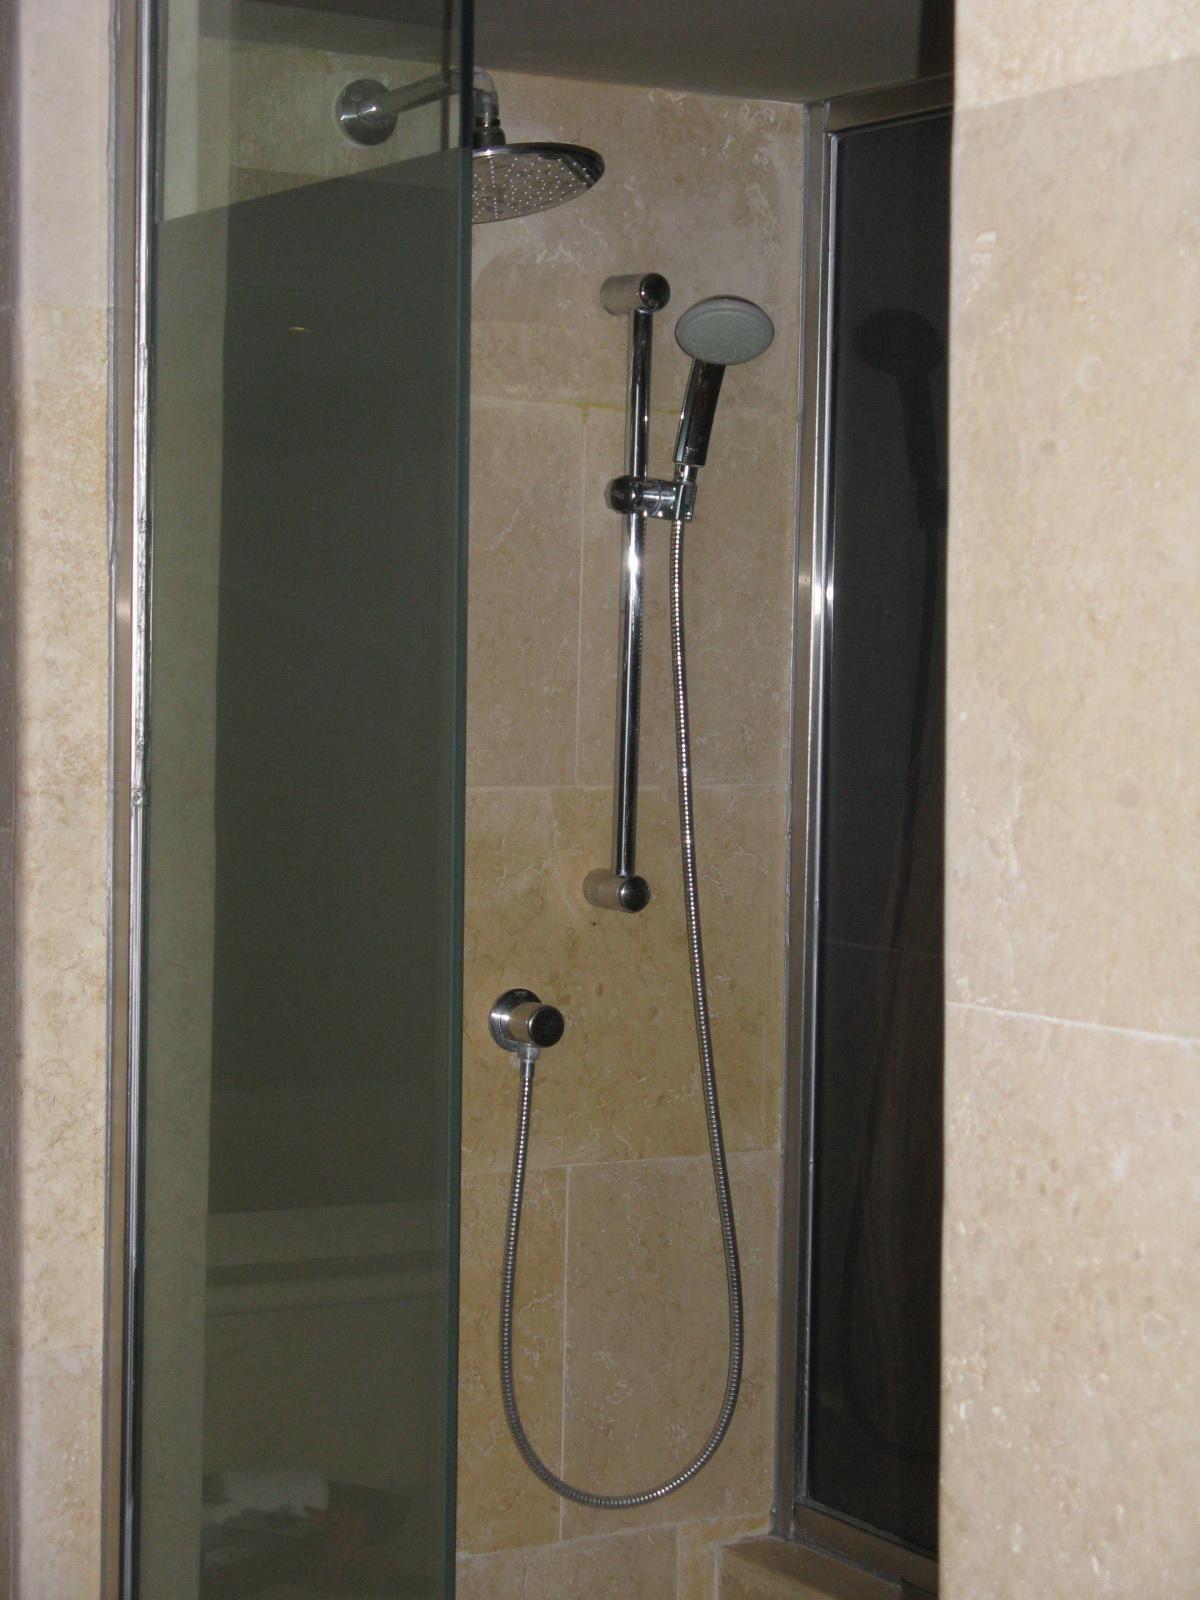 http://walkinshowers.org/best-handheld-shower-head-reviews.html ...